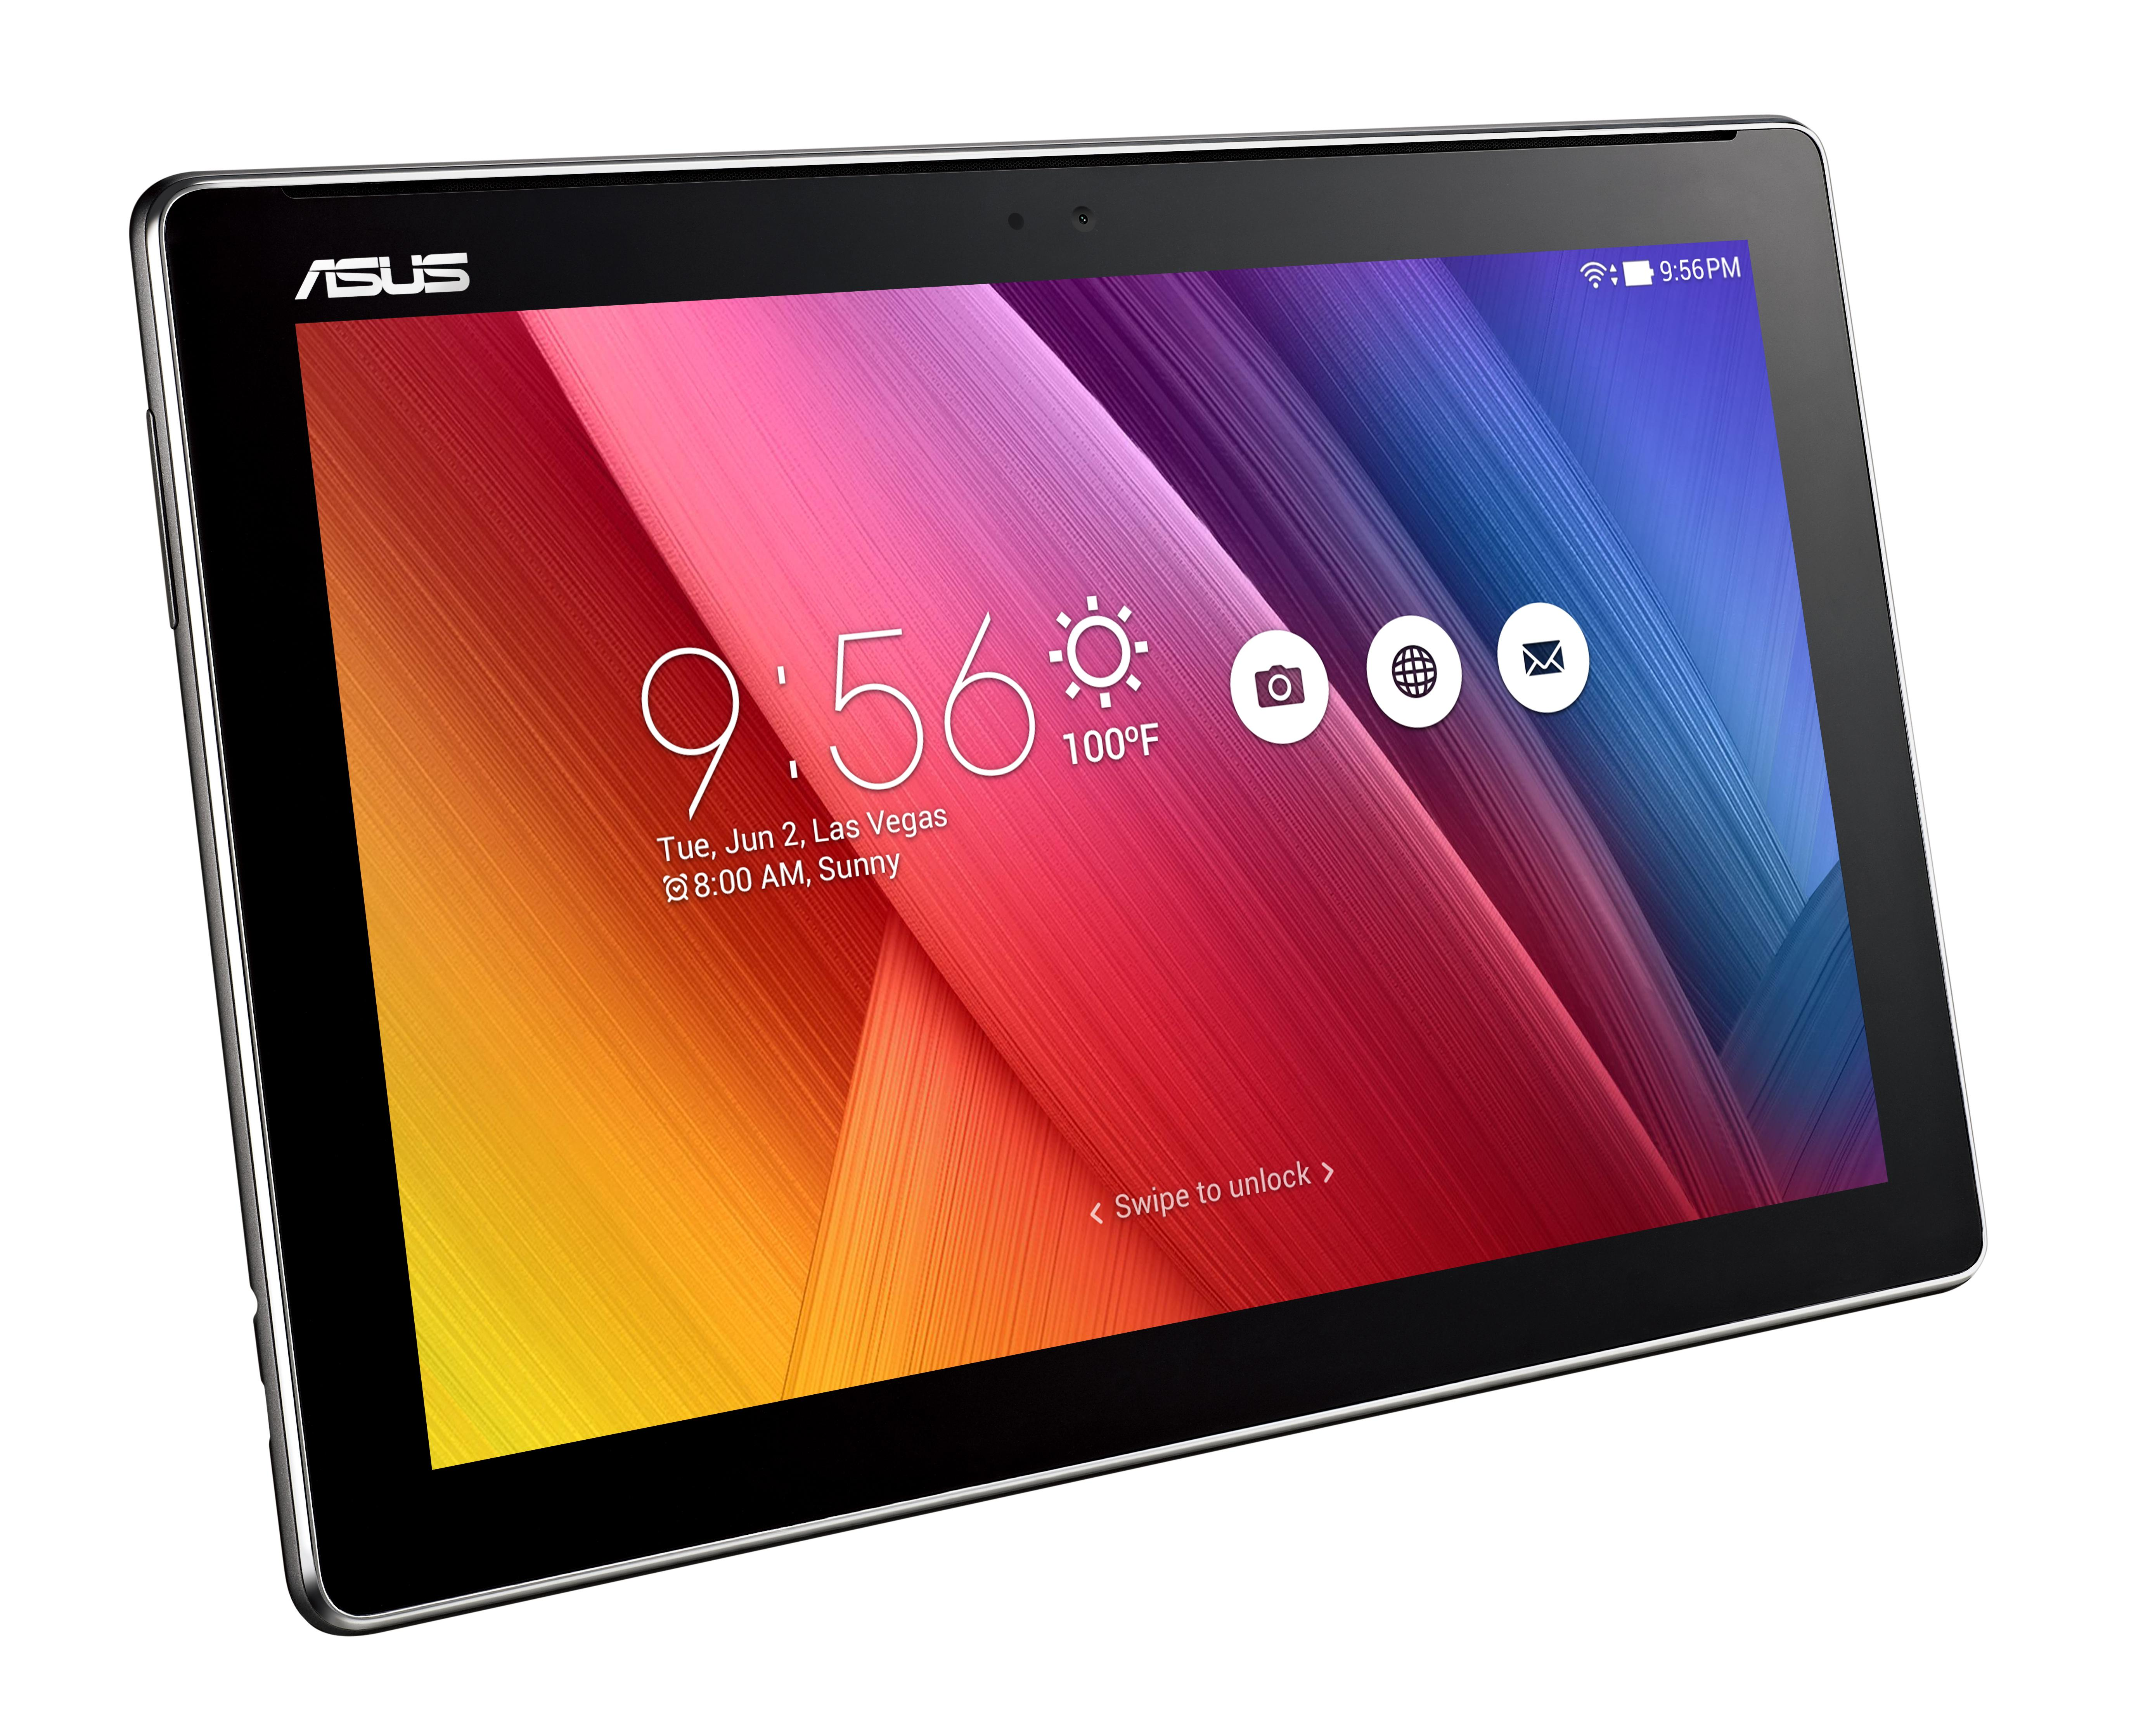 "Asus ZenPad 10 MTK8163/2GB/32GB/10,1""/1280x800/IPS/Android M/grey"